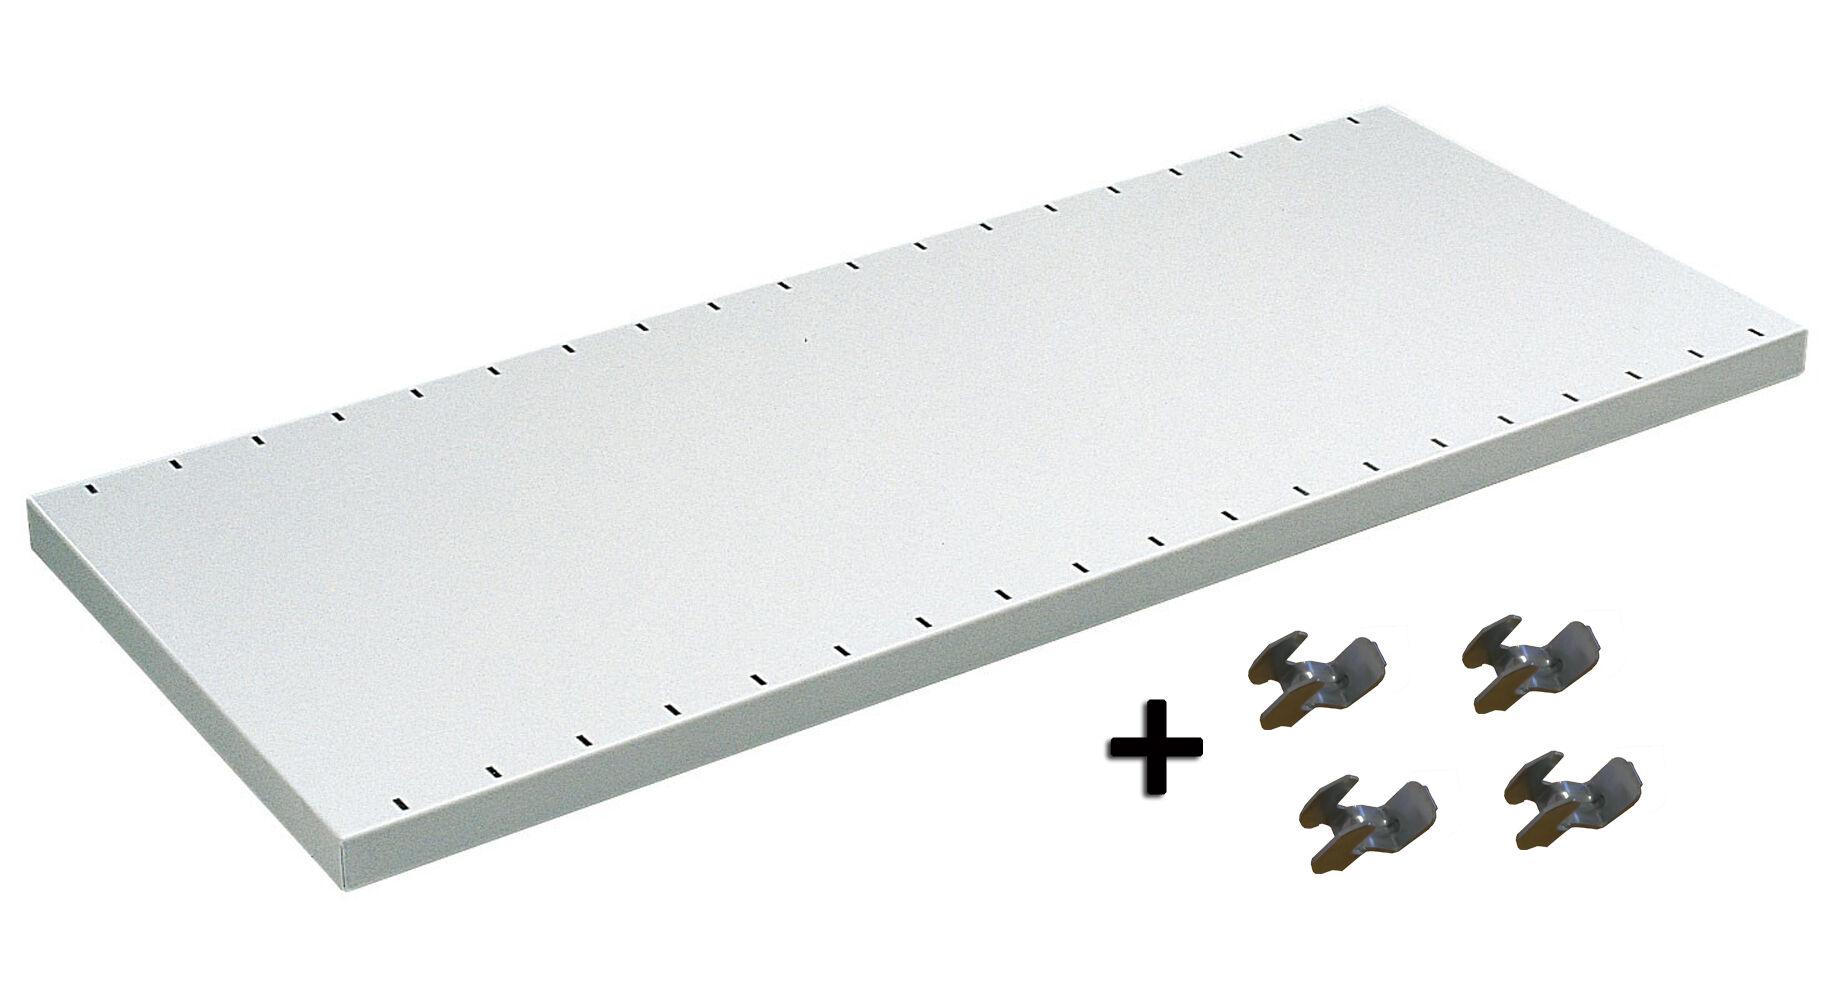 SETAM Tablette rayonnage 77x70 renforcée charge 125 kg